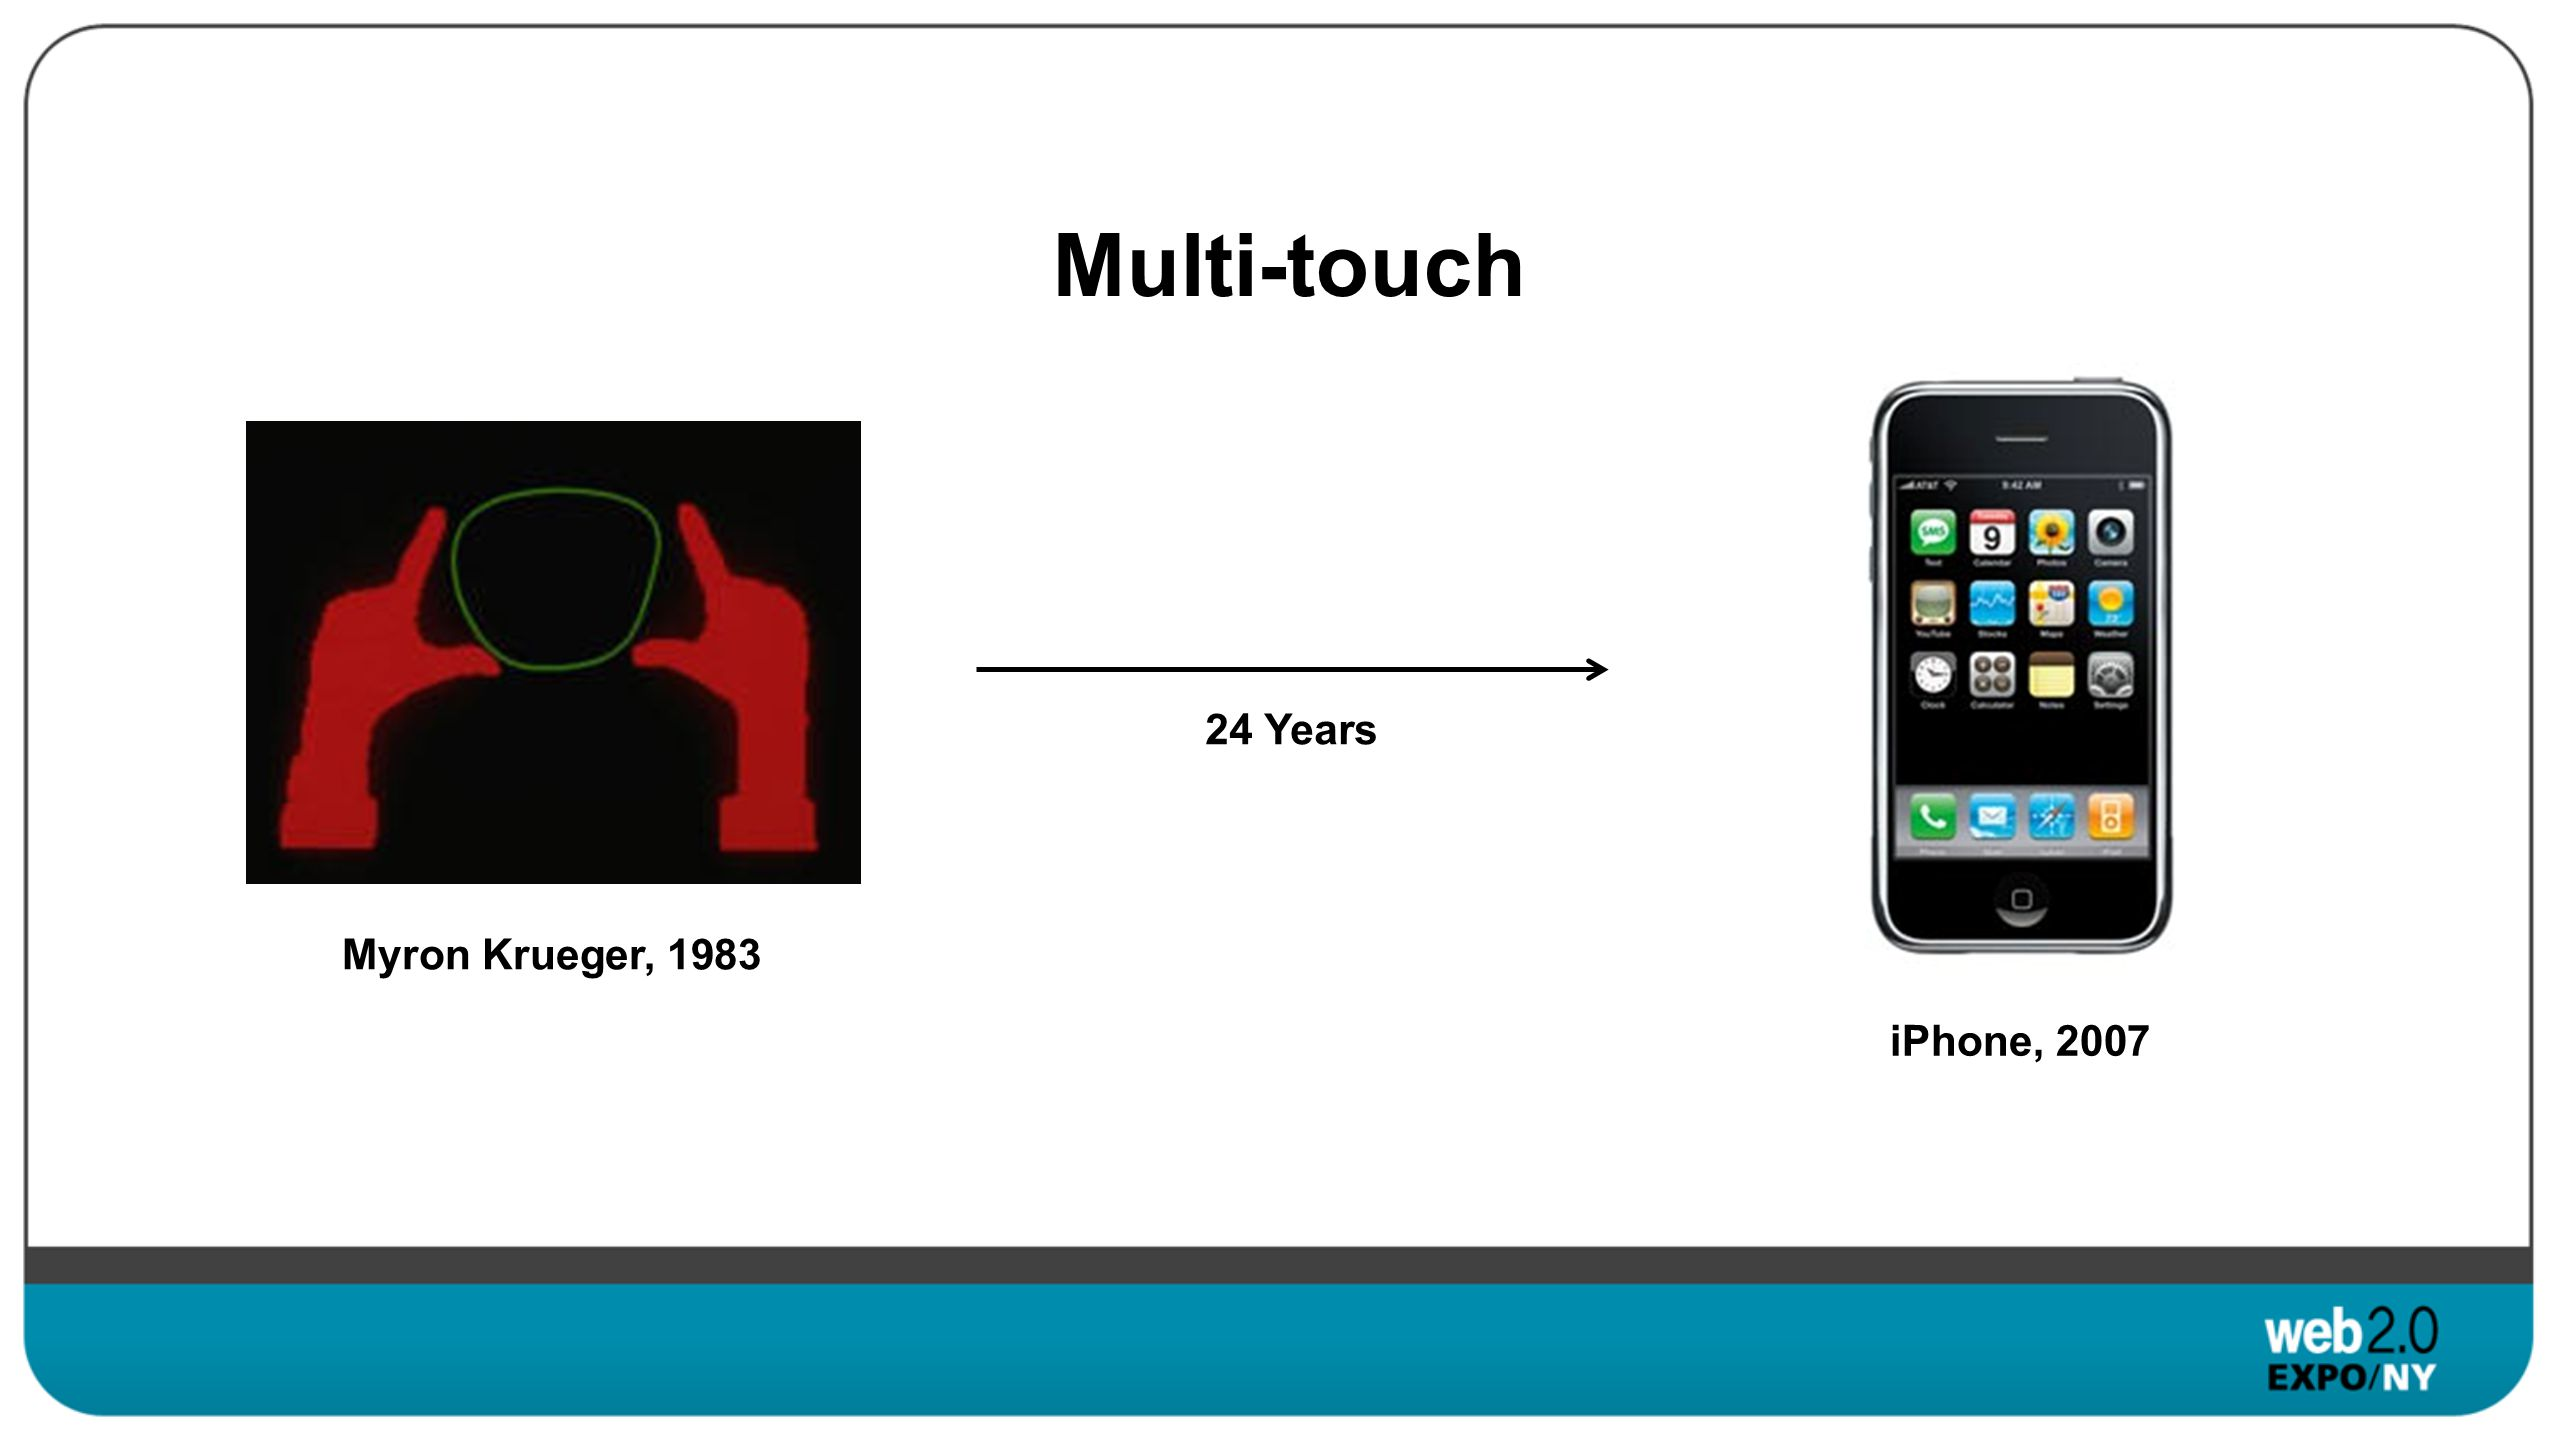 Myron Krueger, 1983 iPhone, 2007 Multi-touch 24 Years